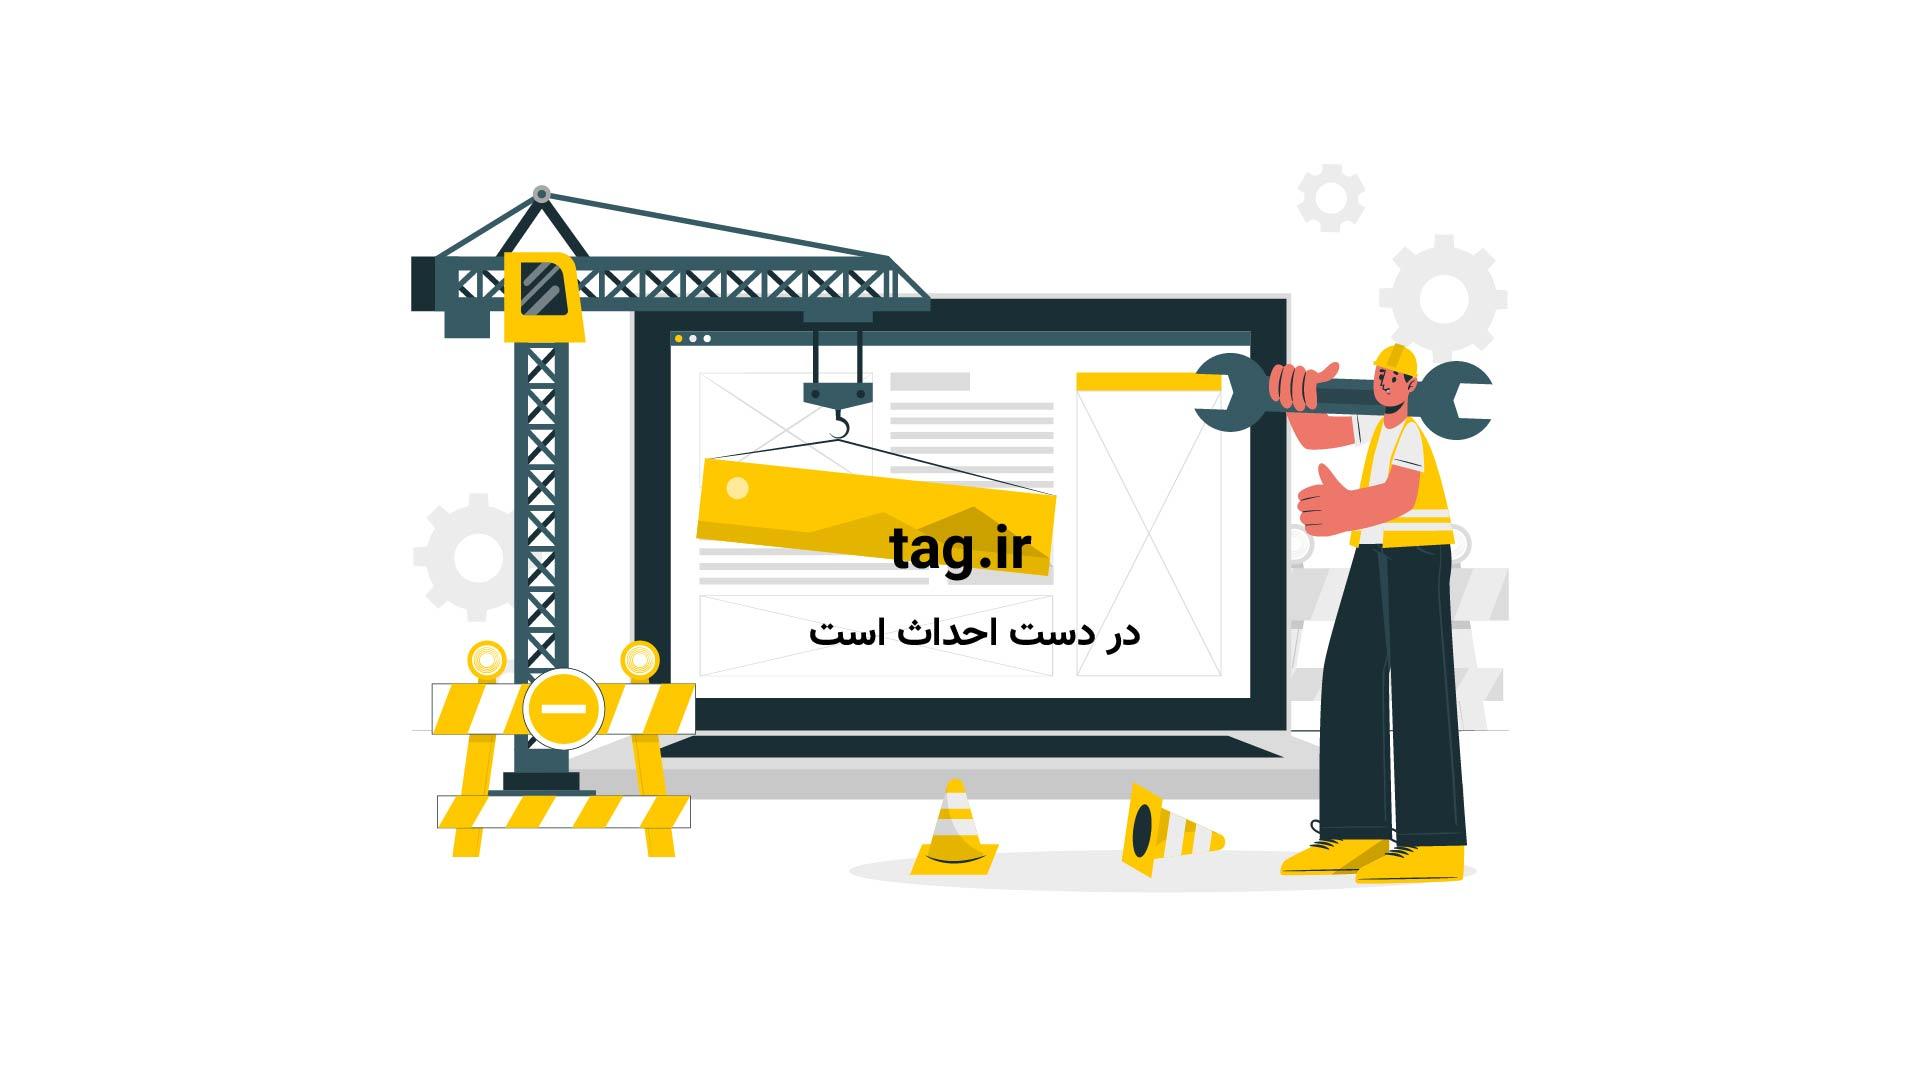 حمله مردم به خودرویی که قاتل اهورا | تگ